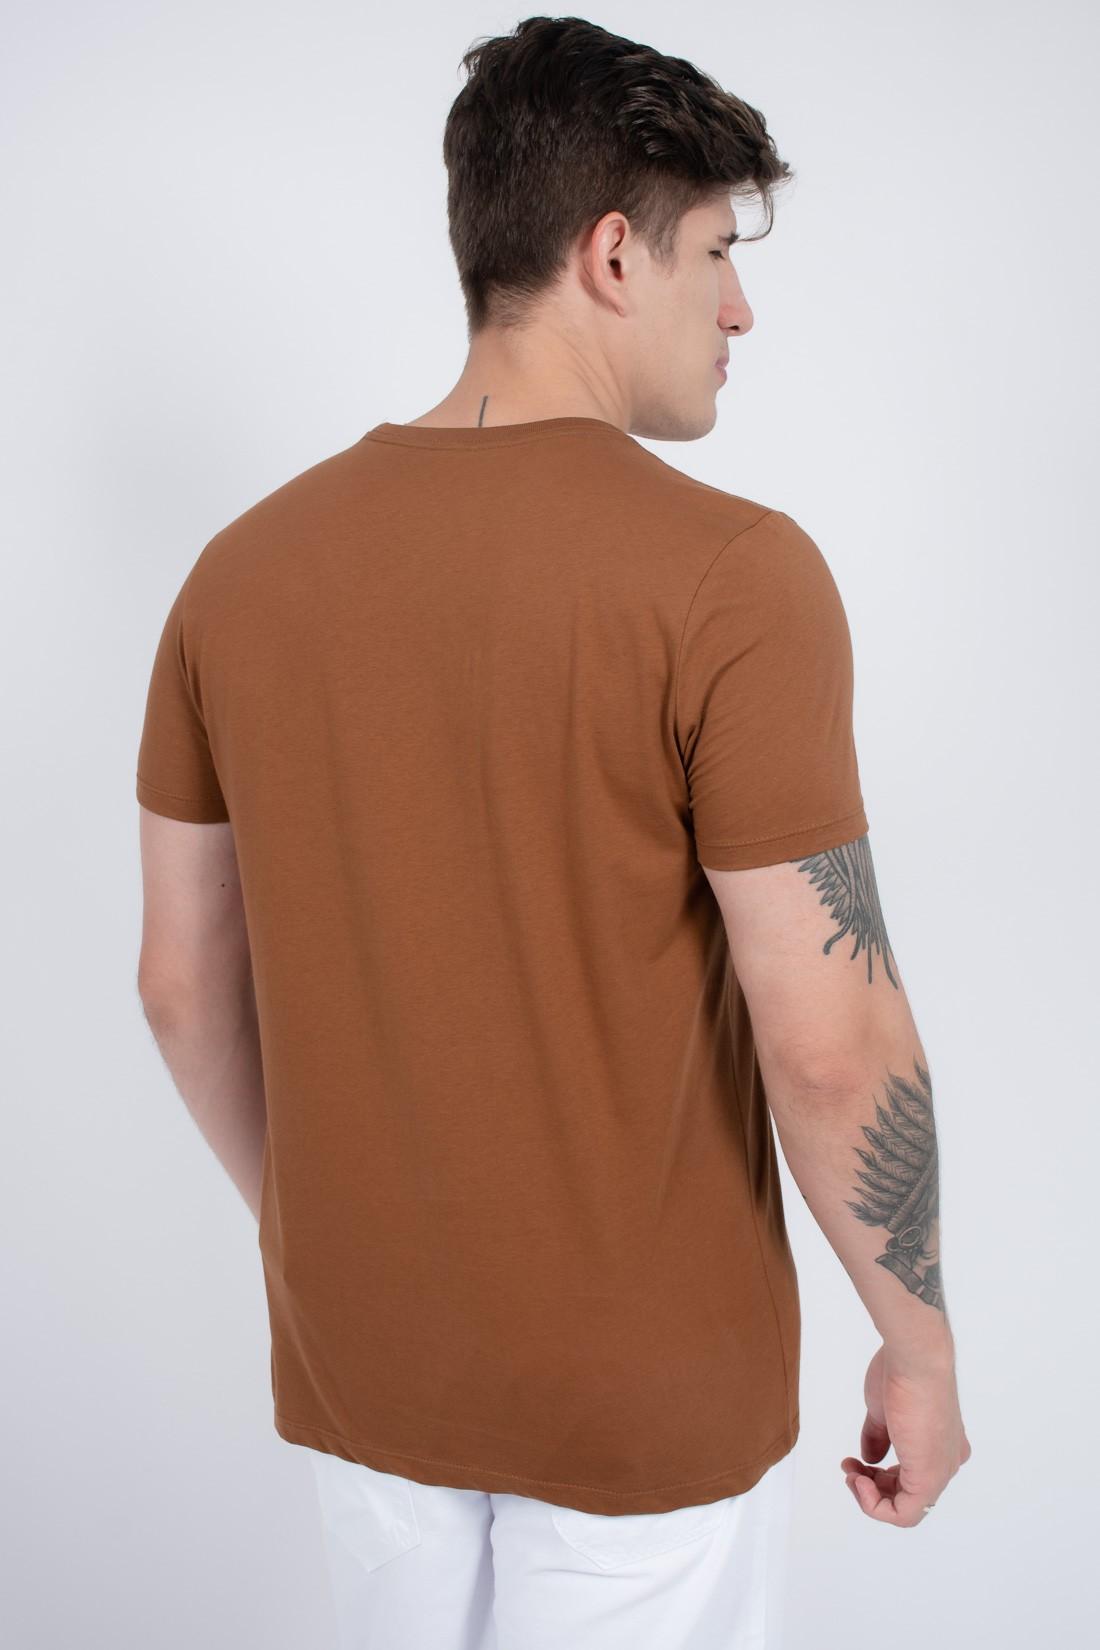 Camiseta Mc Colcci This Is A World